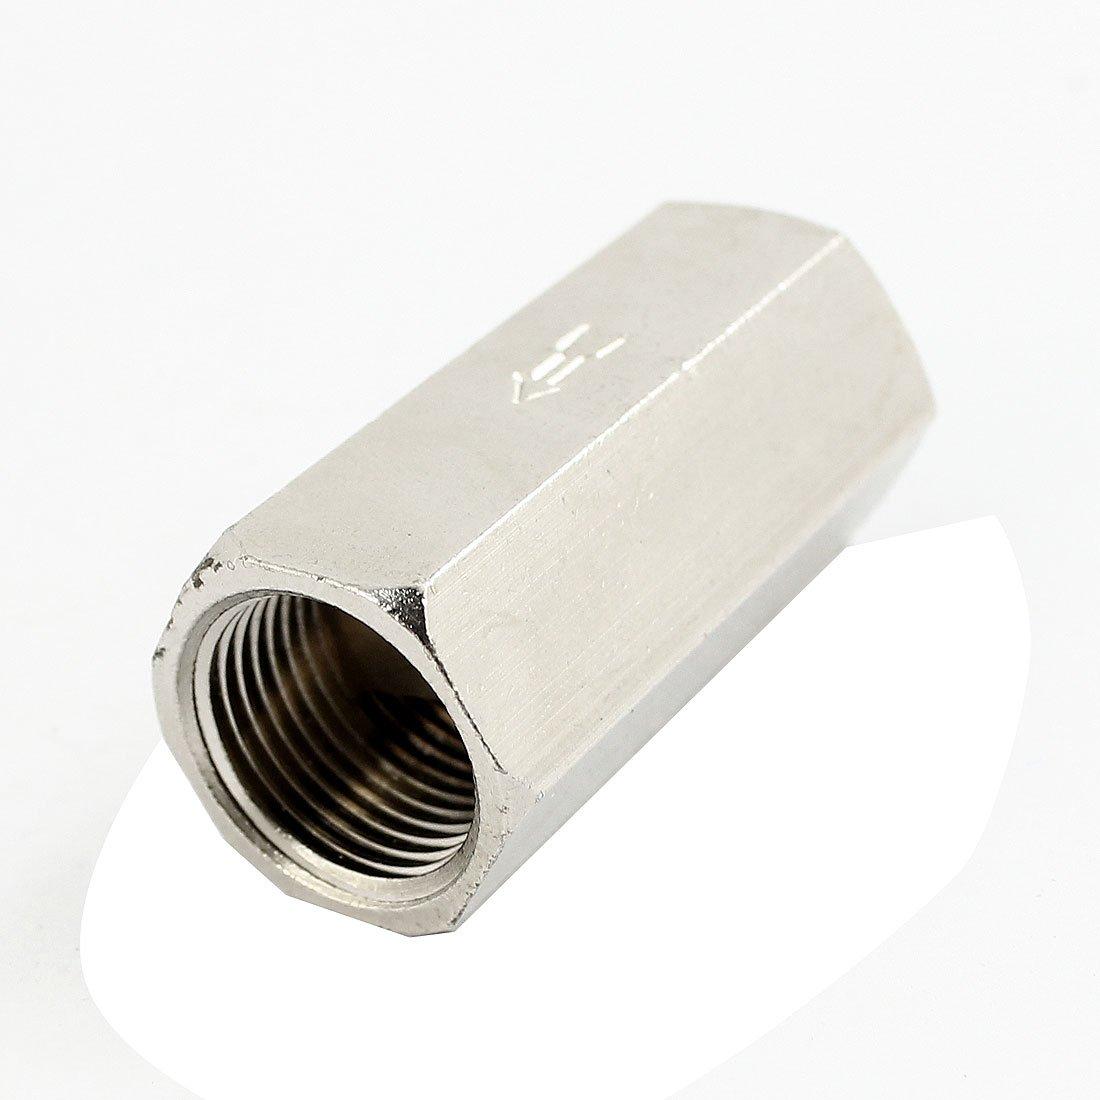 3//8PT rosca recta Aire neum/ático /único Camino v/álvula de retenci/ón tono Plata